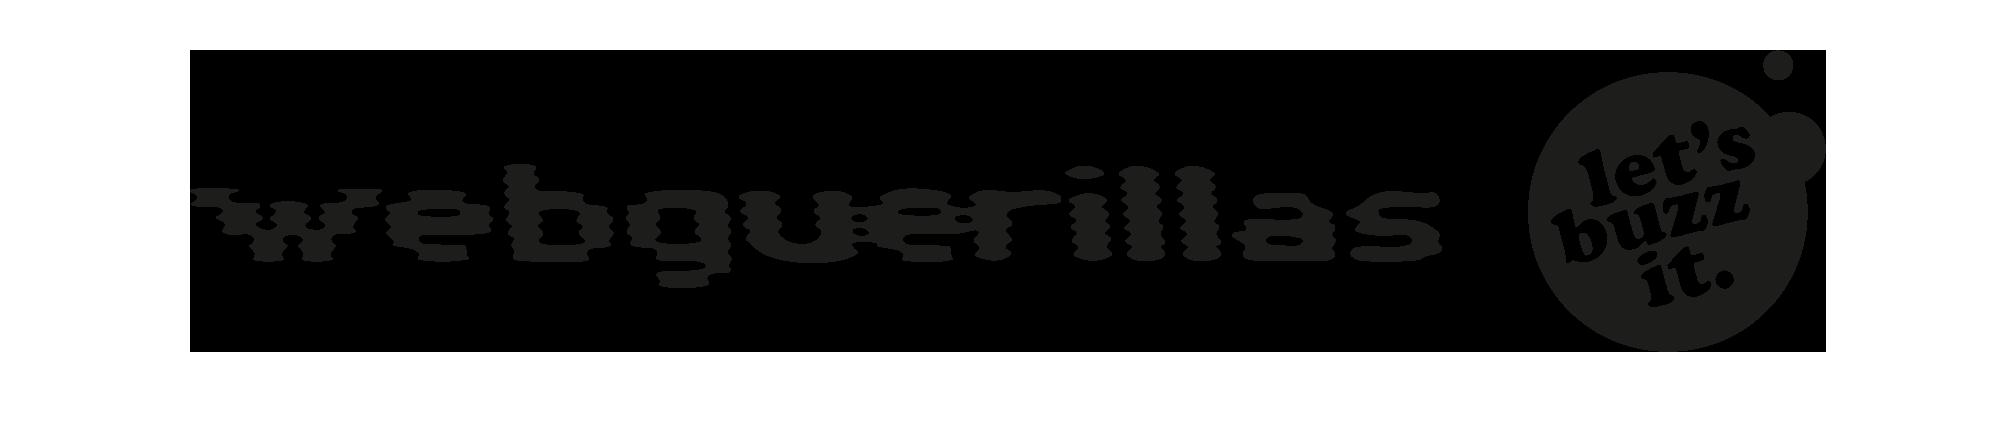 webg_Logo_black_RGB.png